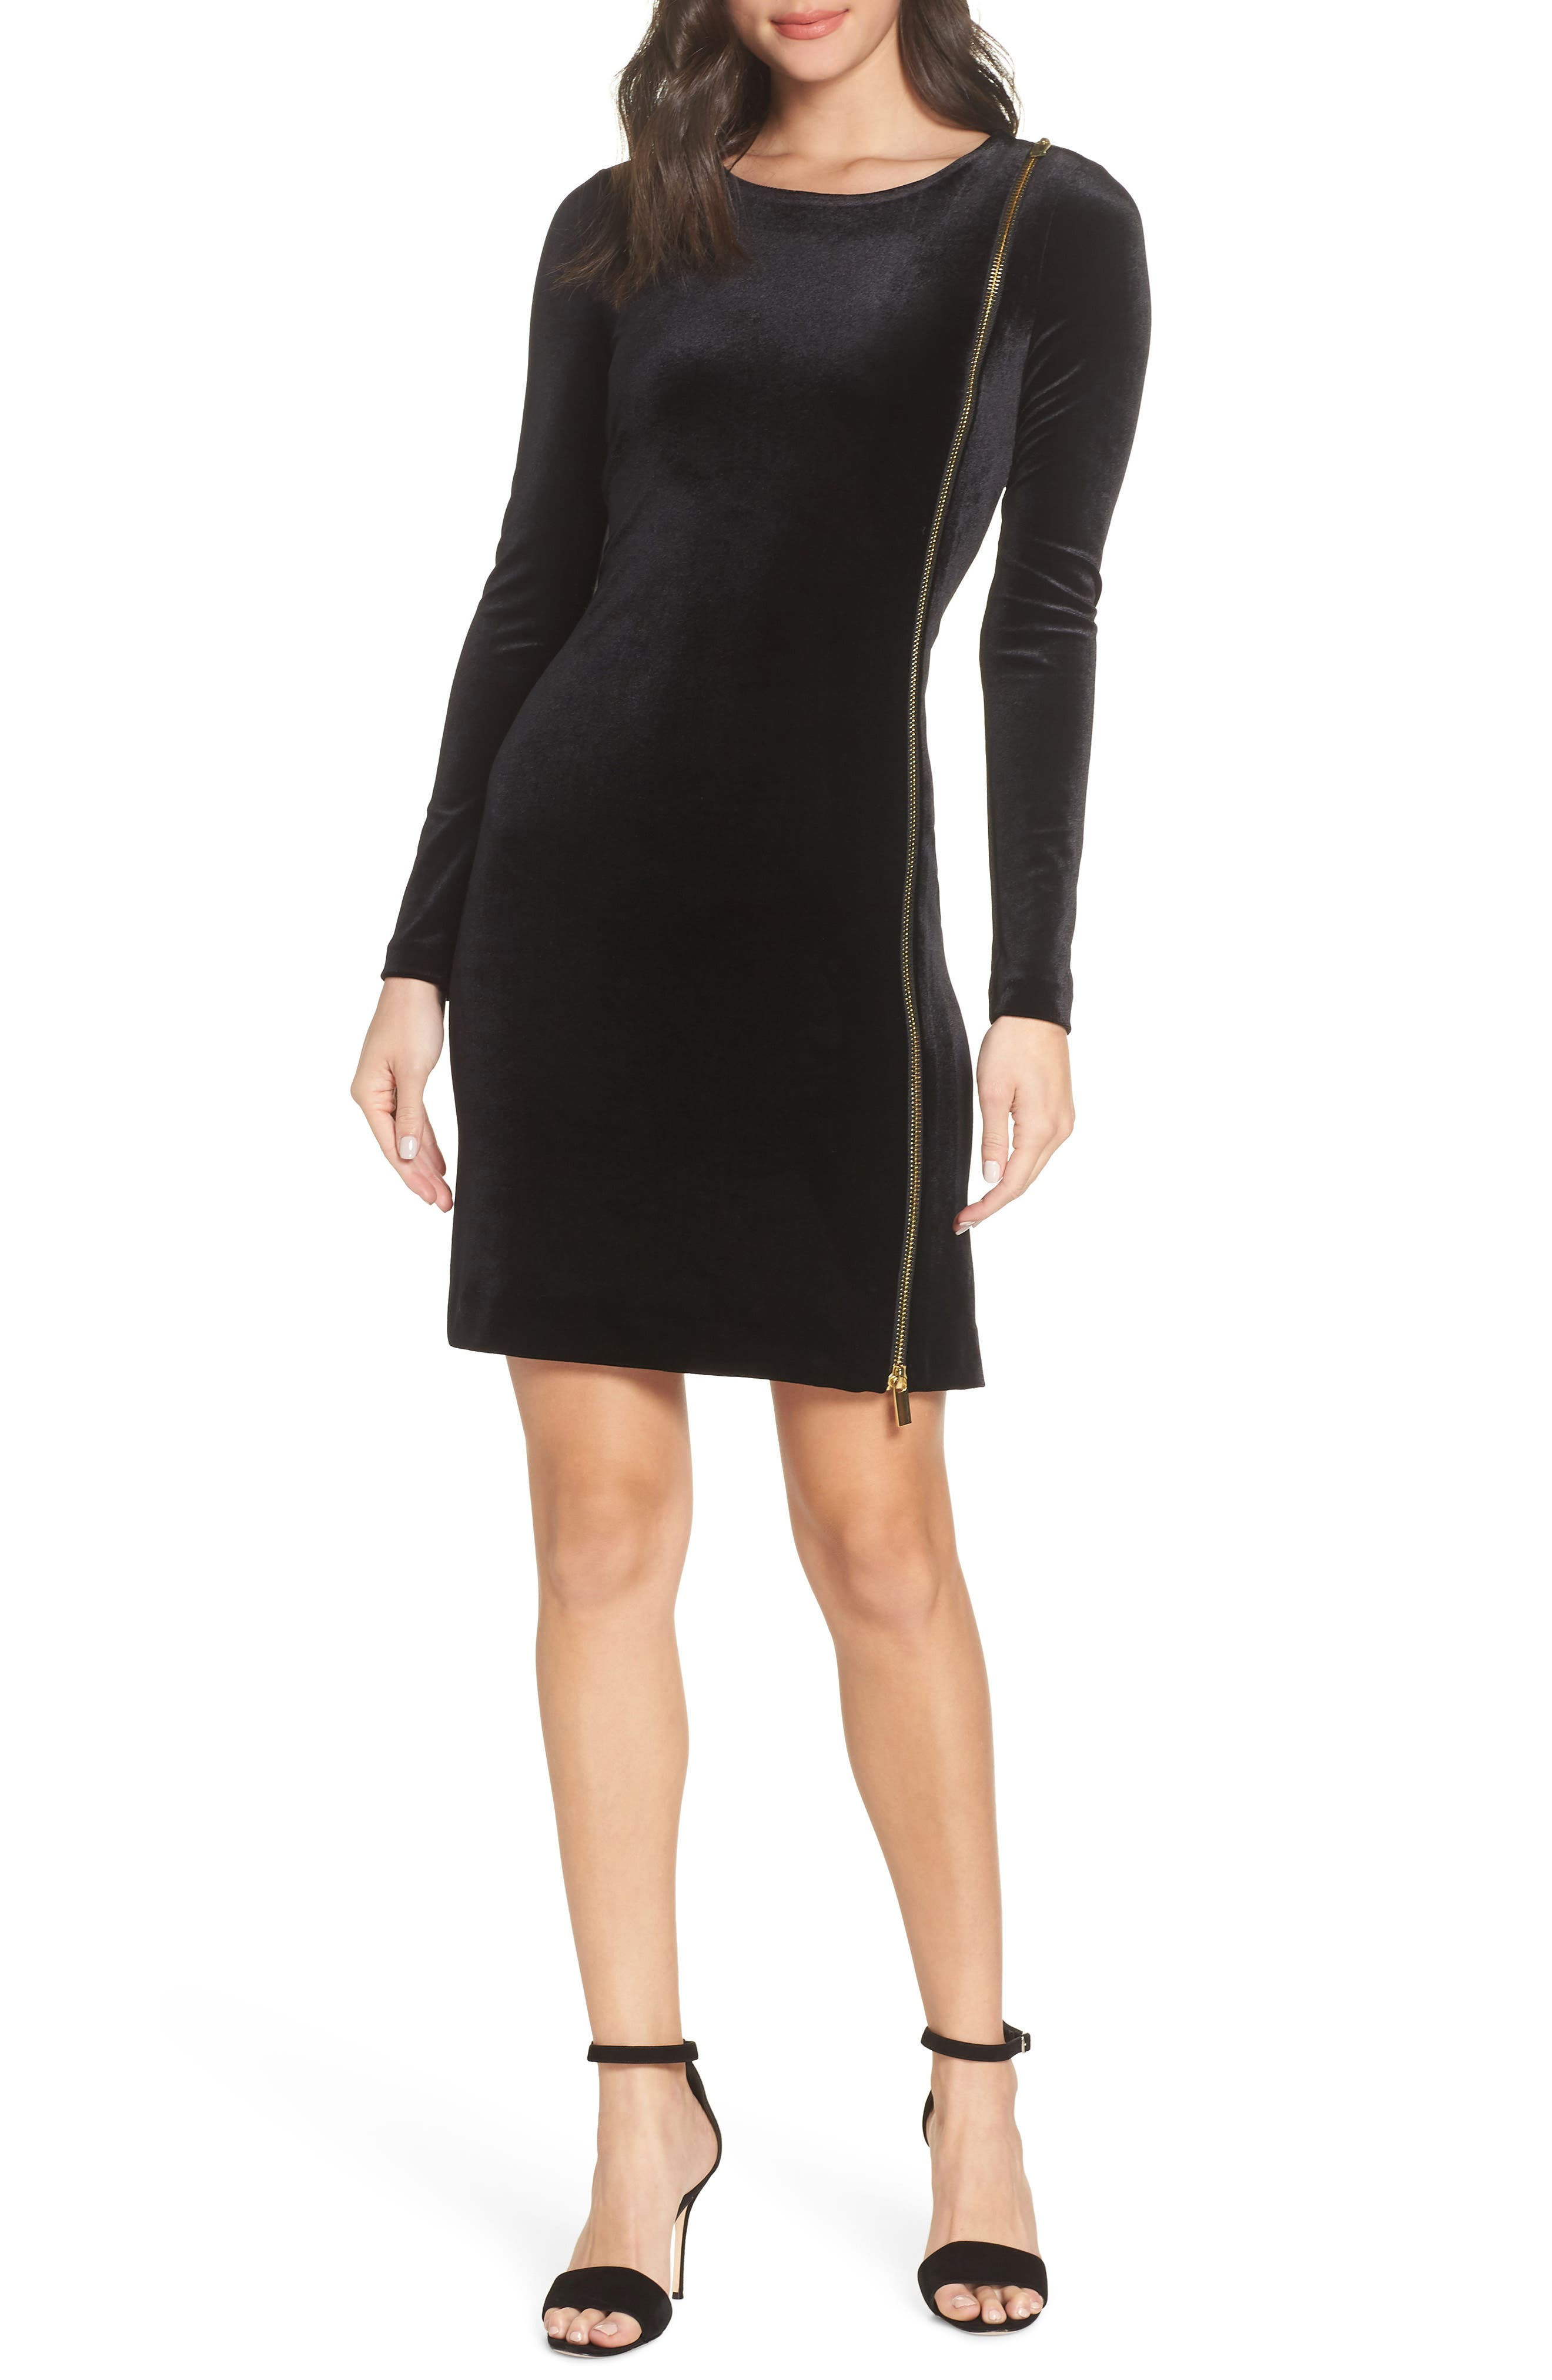 Zella Aurore Velvet Jersey Sheath Dress,                         Main,                         color, BLACK GOLD